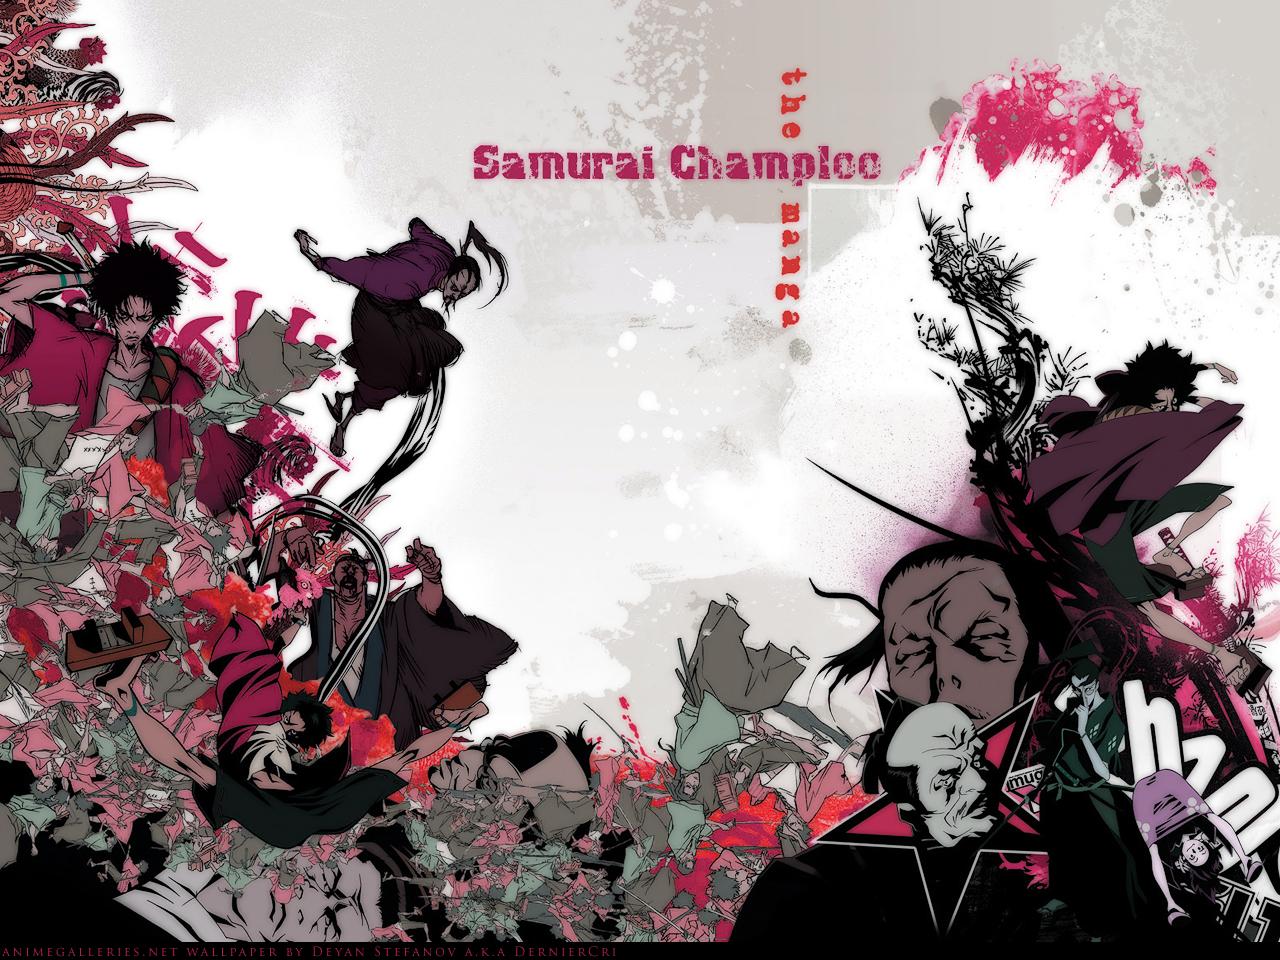 Samurai Champloo Wallpaper #21 (Anime Wallpapers.com)